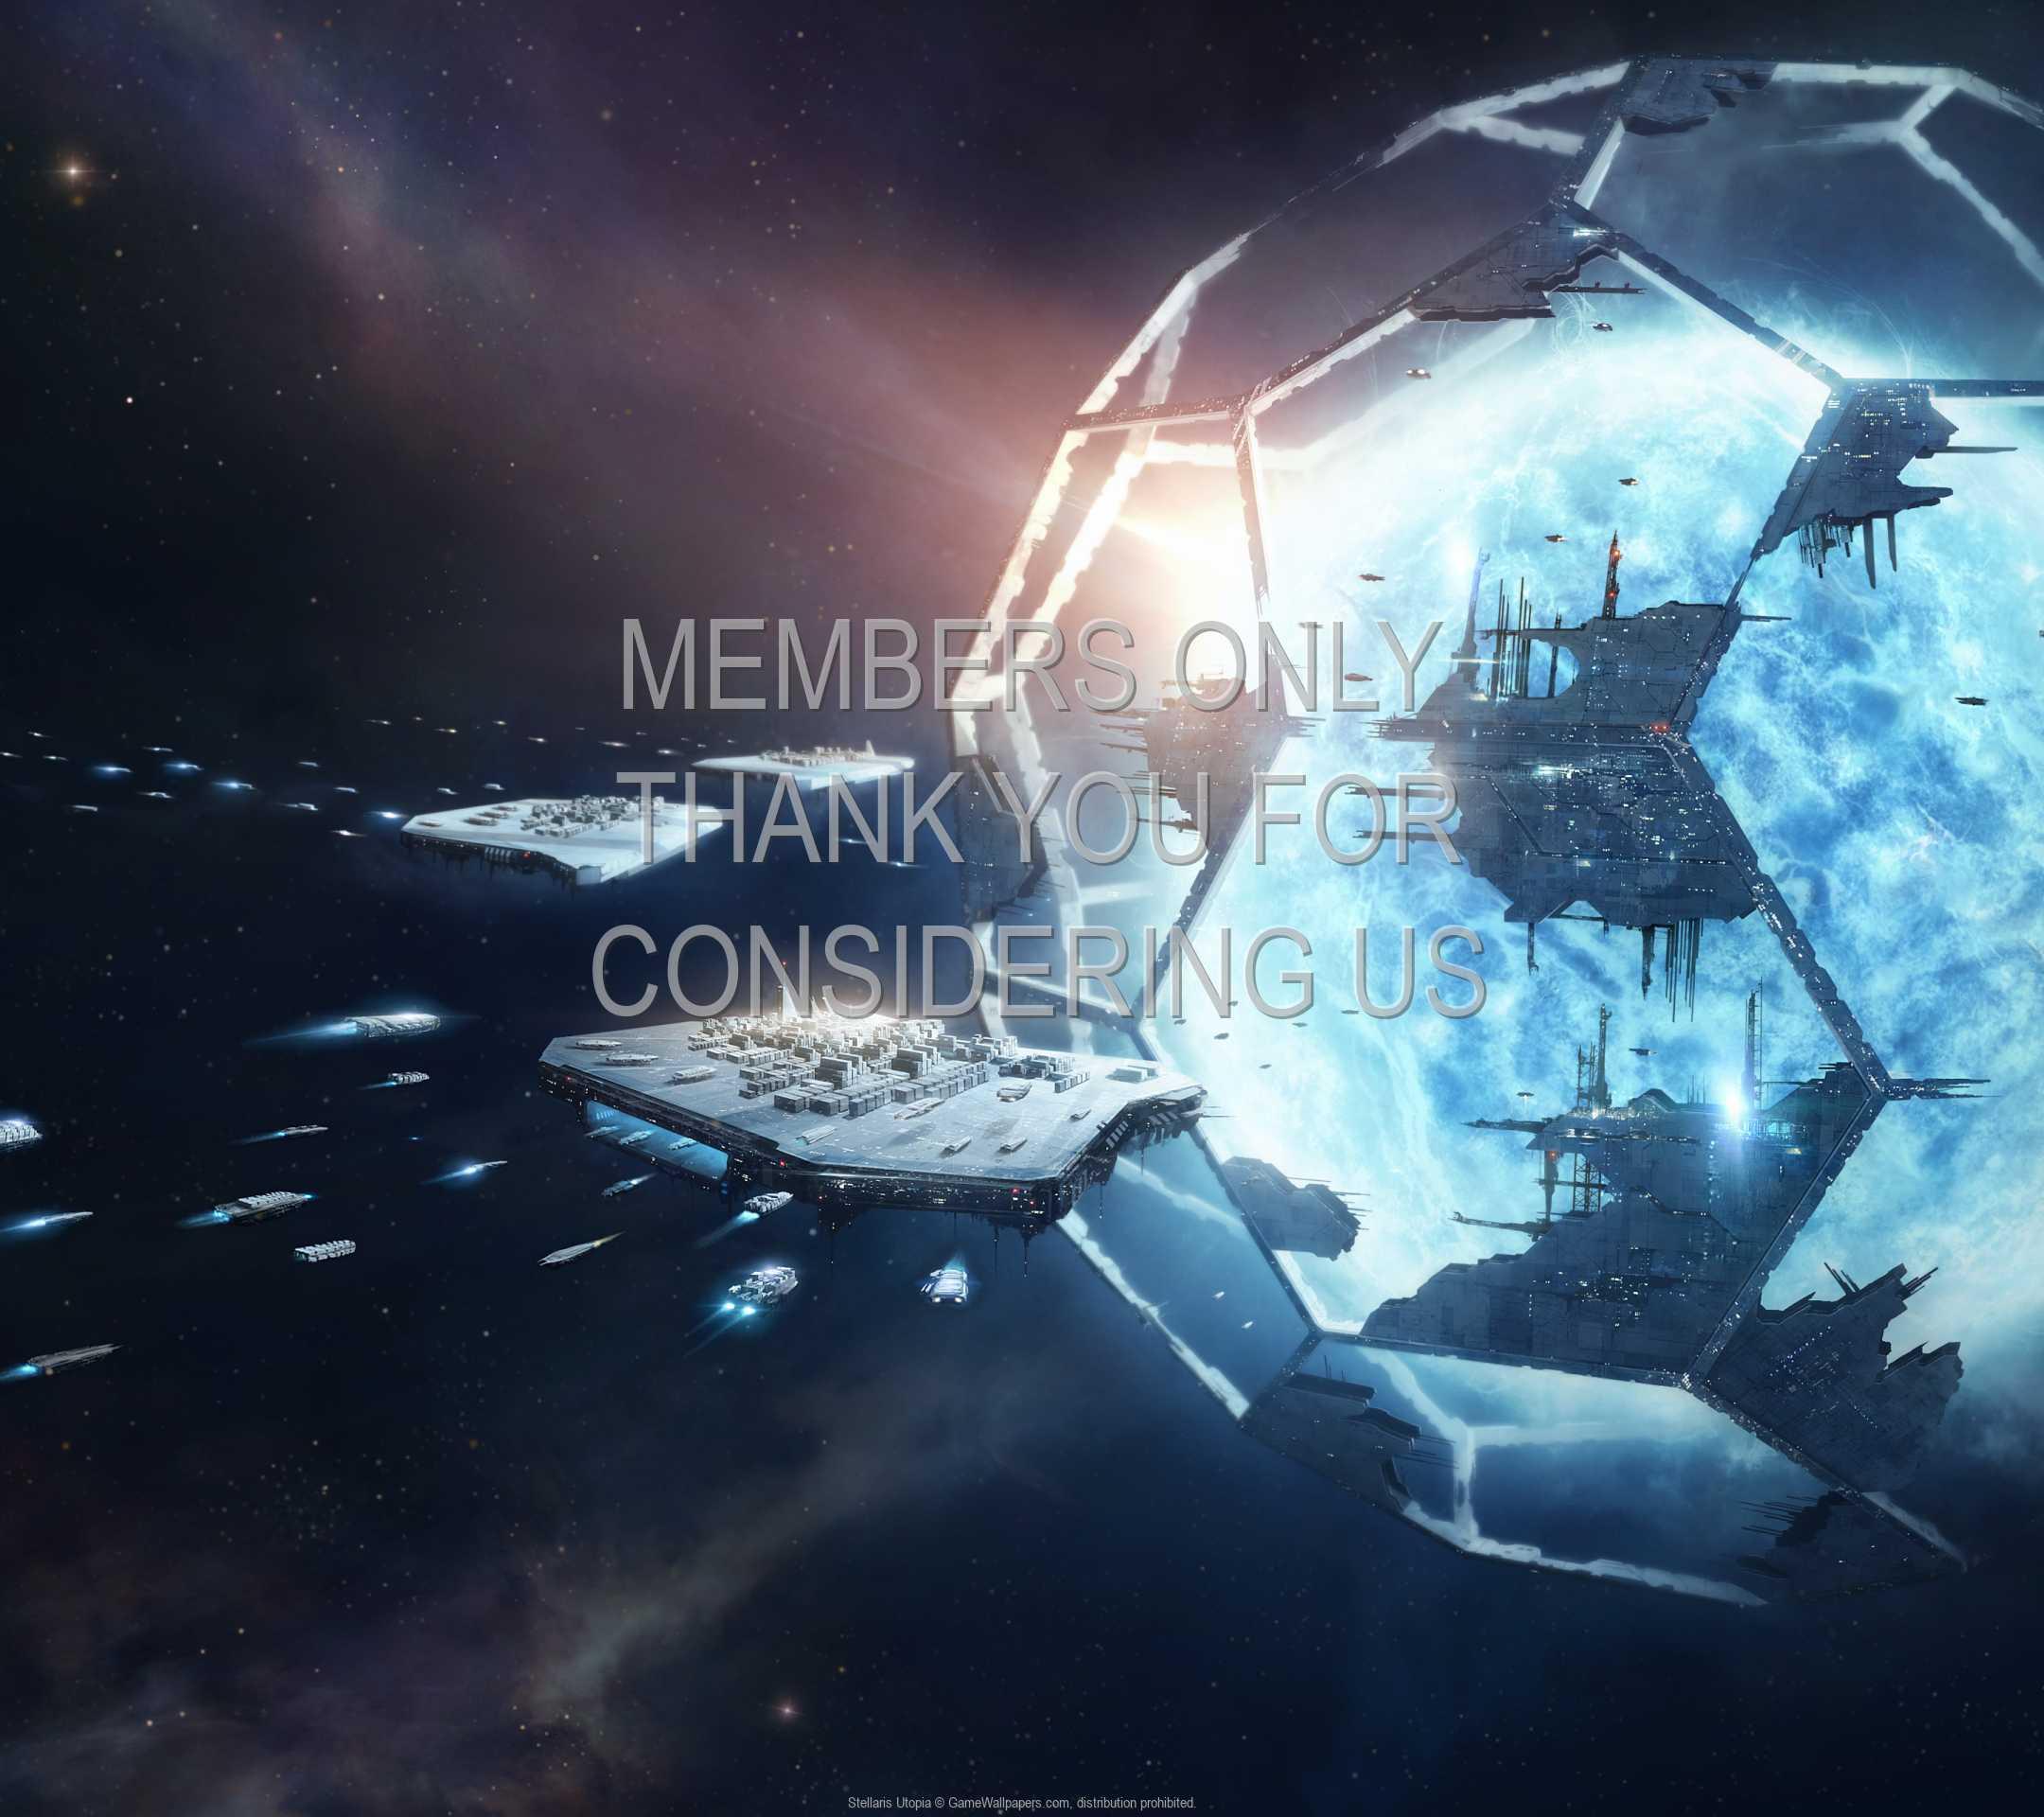 Stellaris Utopia 1080p Horizontal Mobile wallpaper or background 01